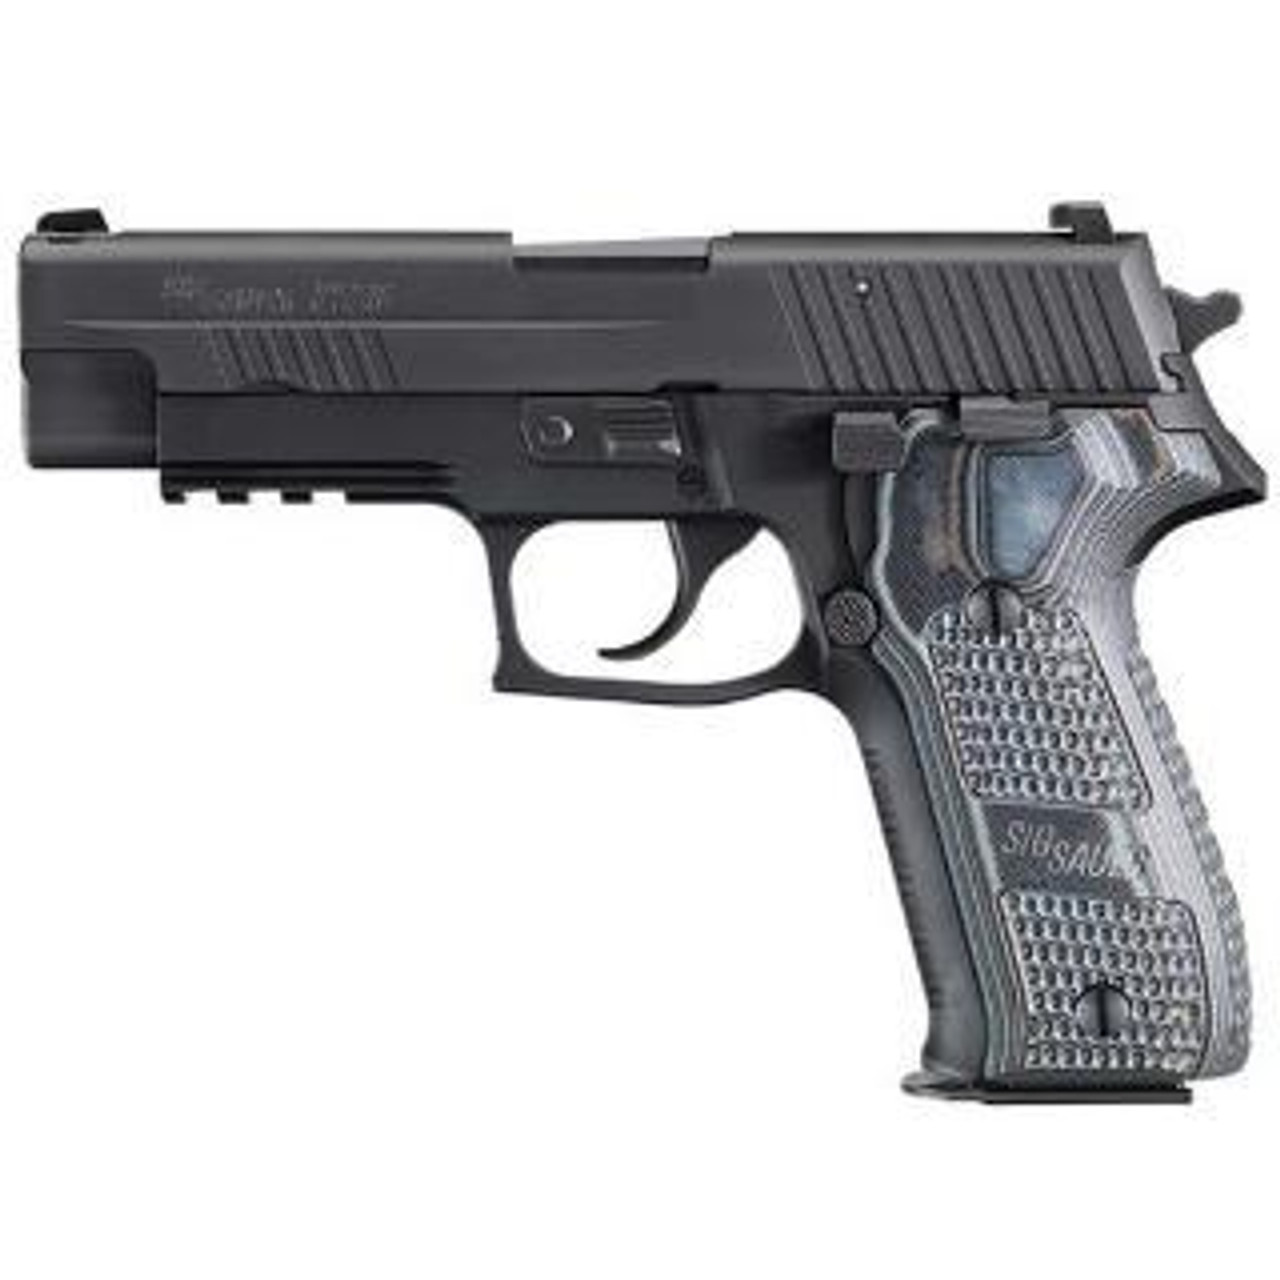 Sig Sauer P226 Extreme CALIFORNIA LEGAL - 9mm